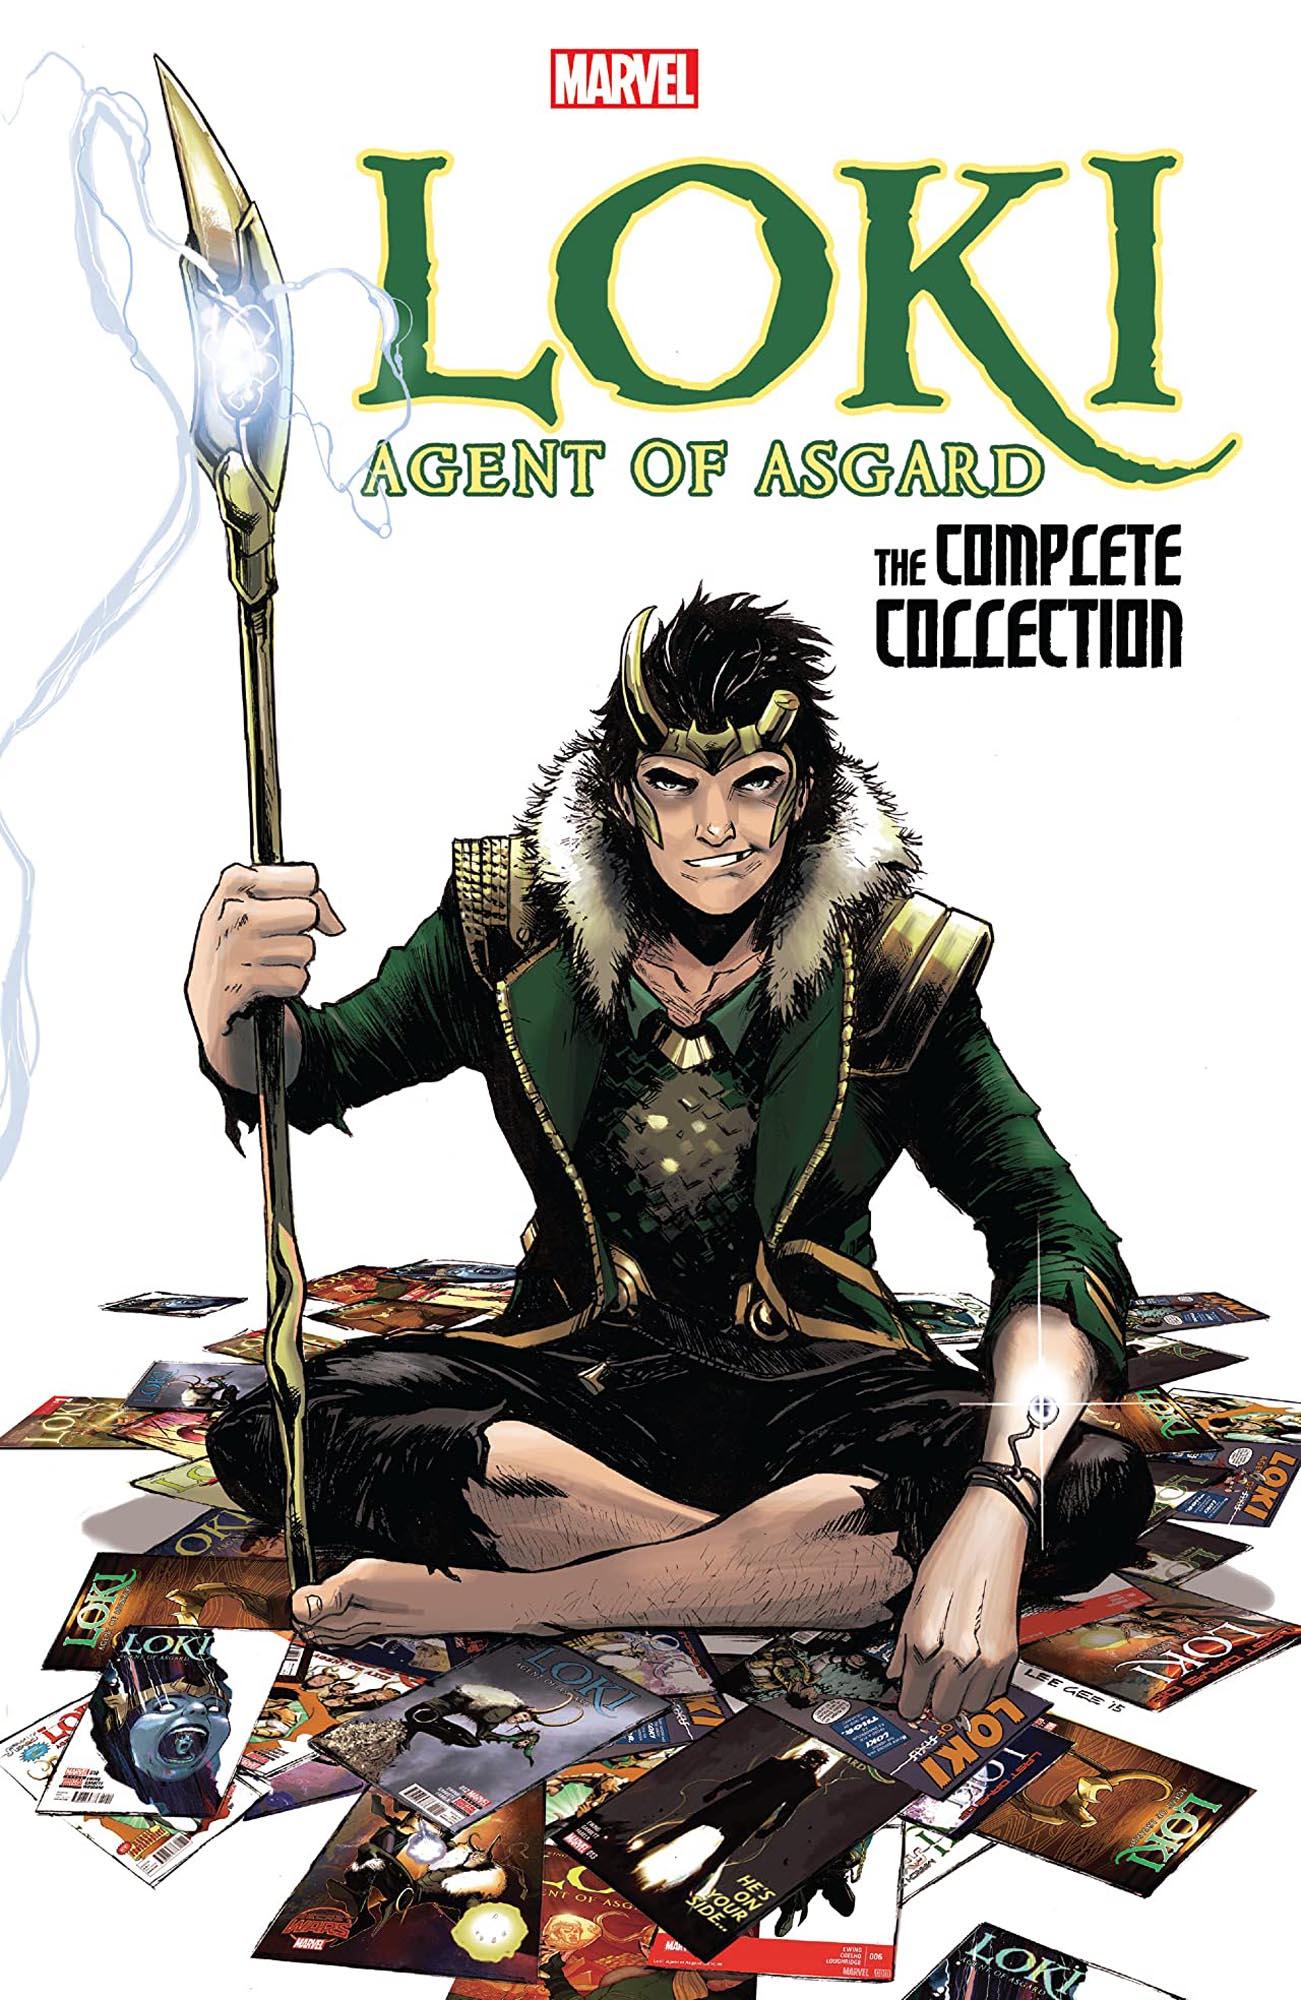 Loki comics- Loki: Agent Of Asgard